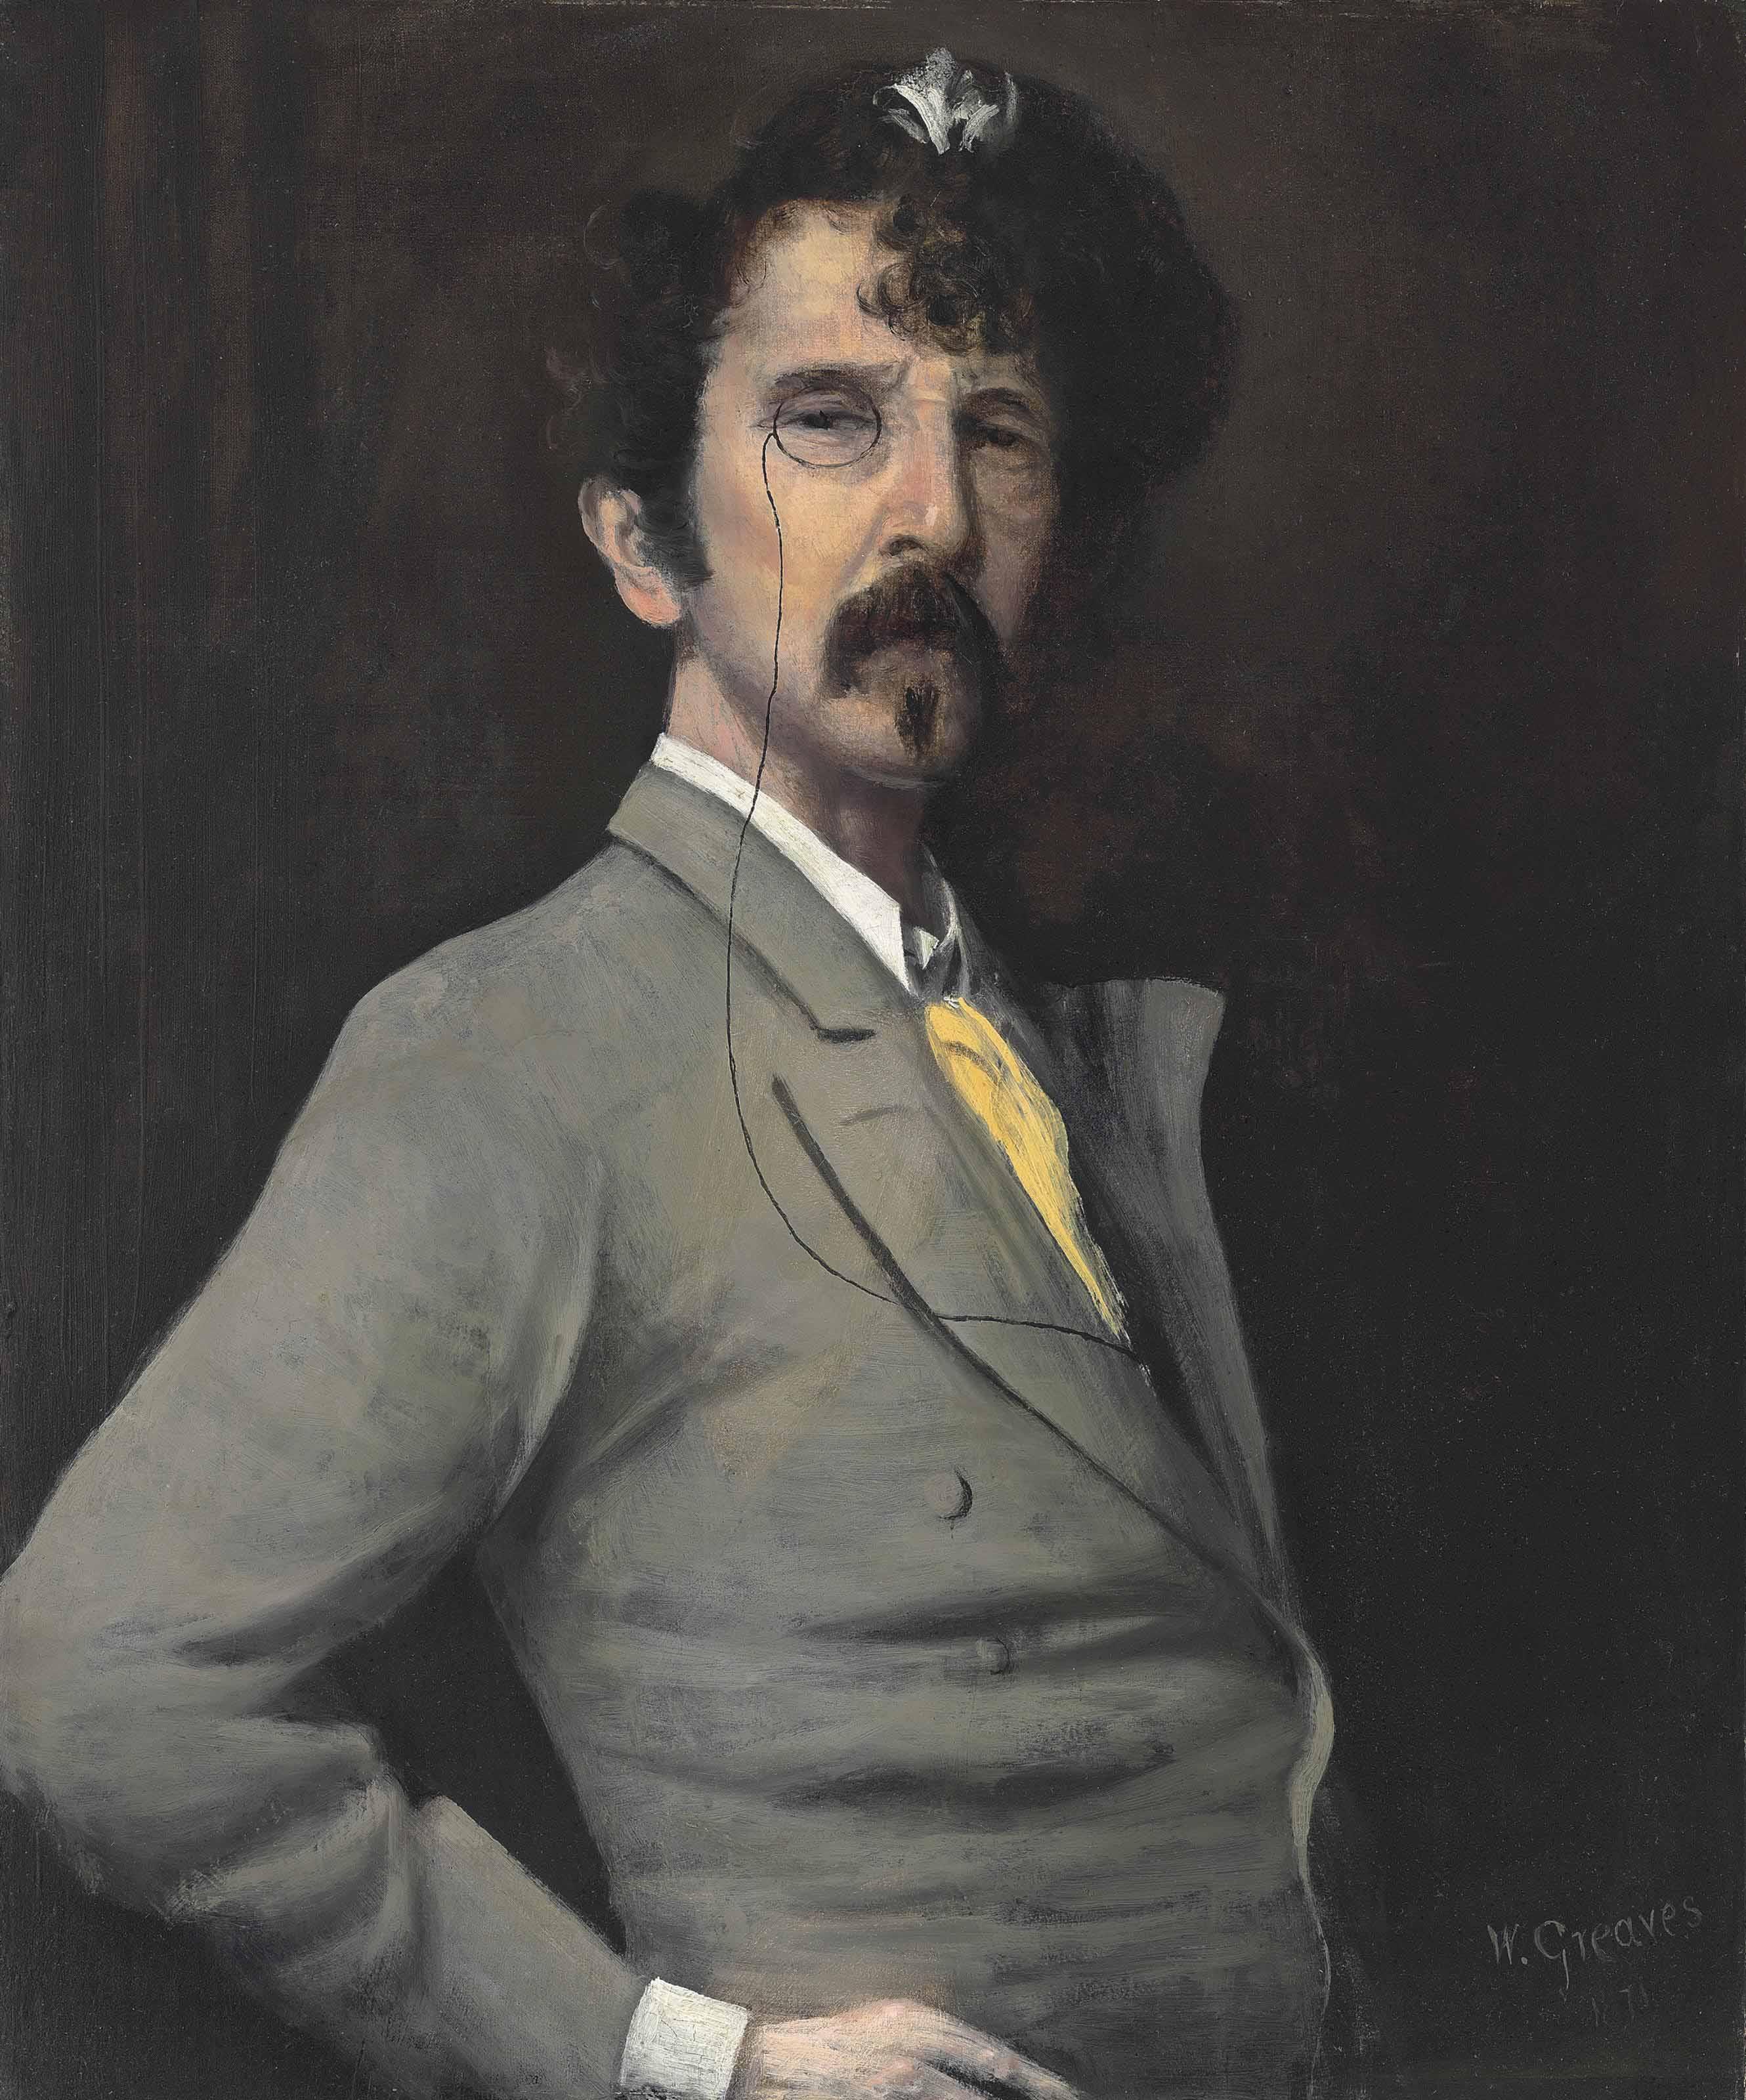 Portrait of James McNeill Whistler